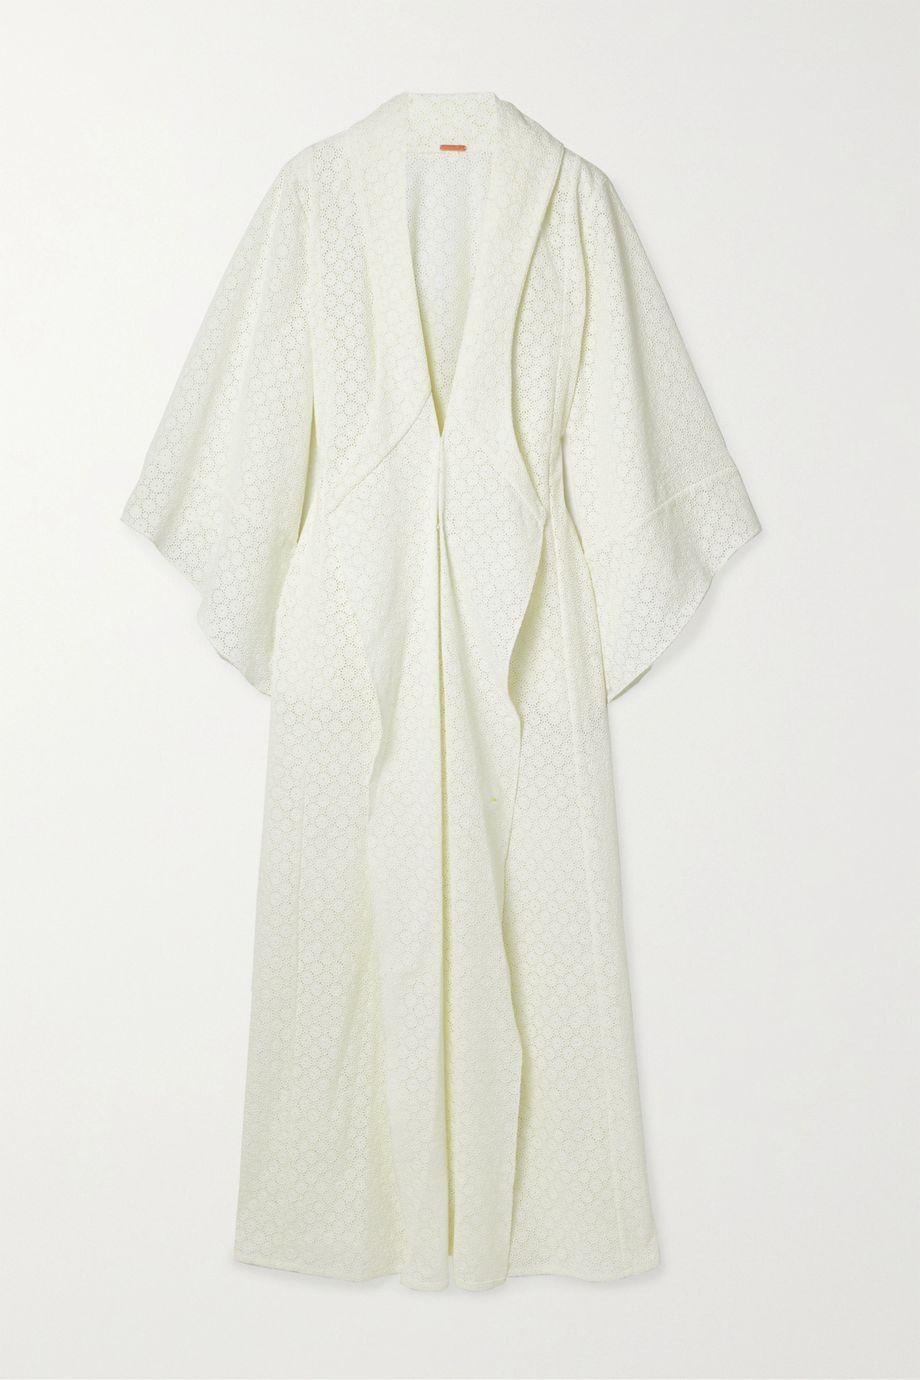 Johanna Ortiz Sea Gull crocheted cotton kimono